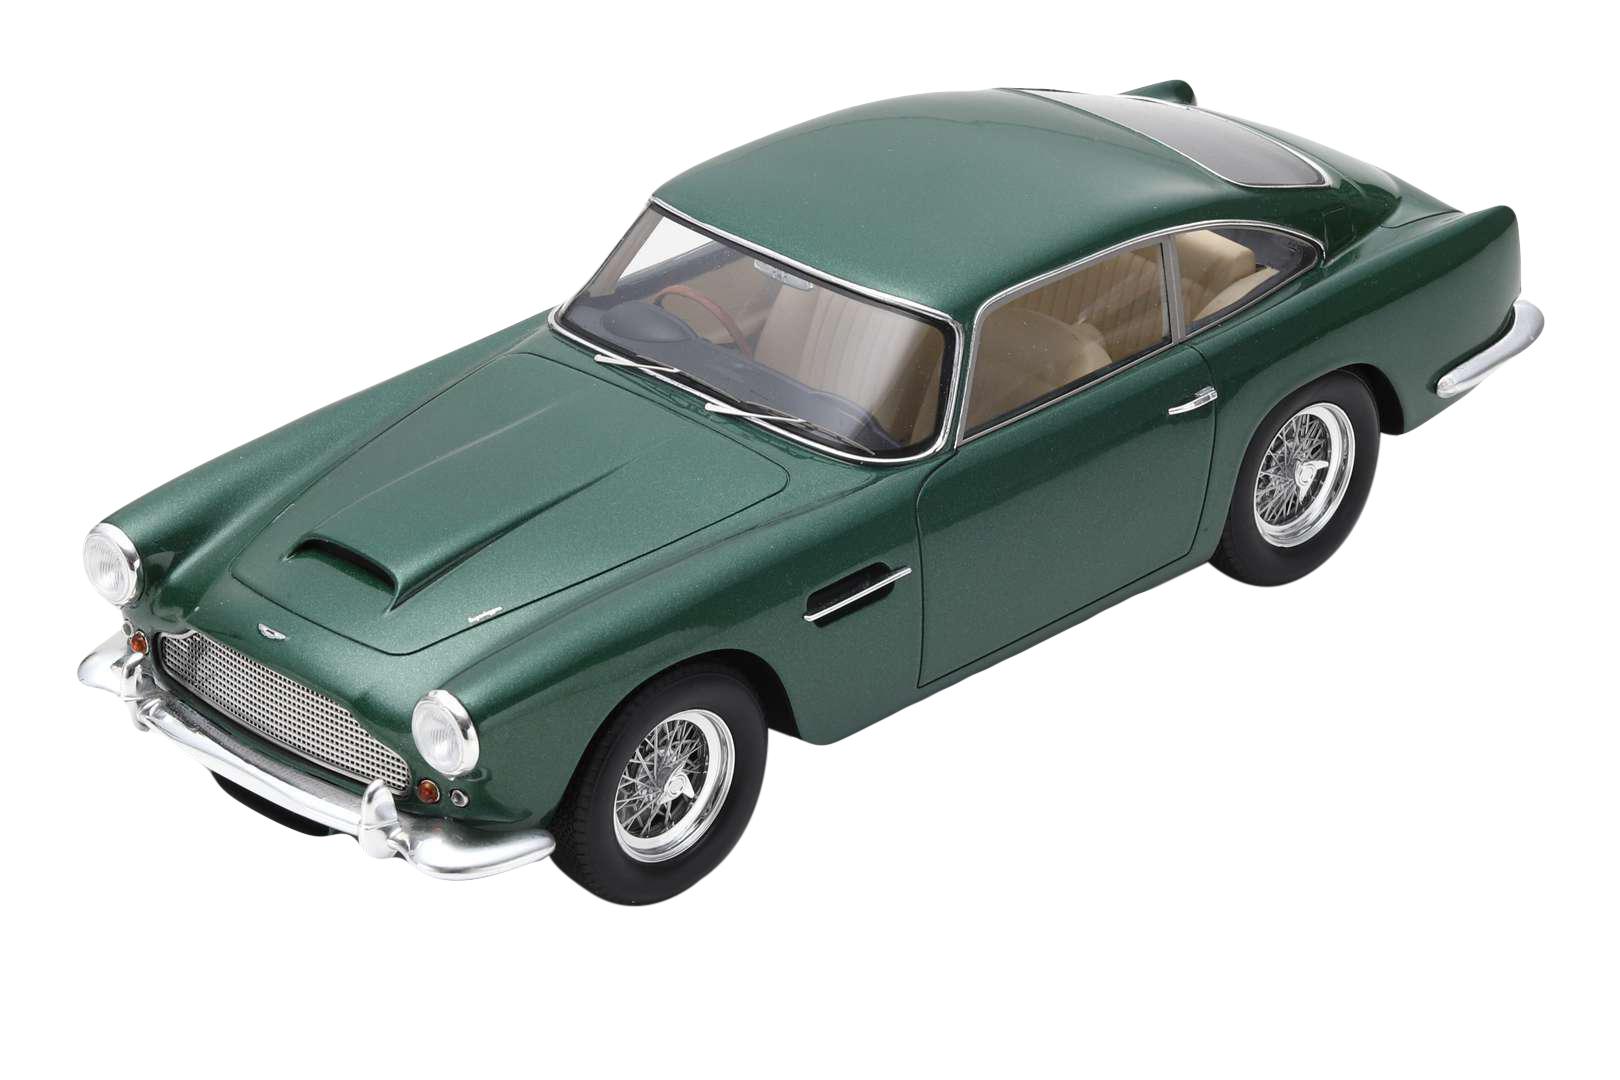 1960 Aston Martin DB4 Series II RHD (Right Hand Drive) Green 1/18 Model Car by Spark